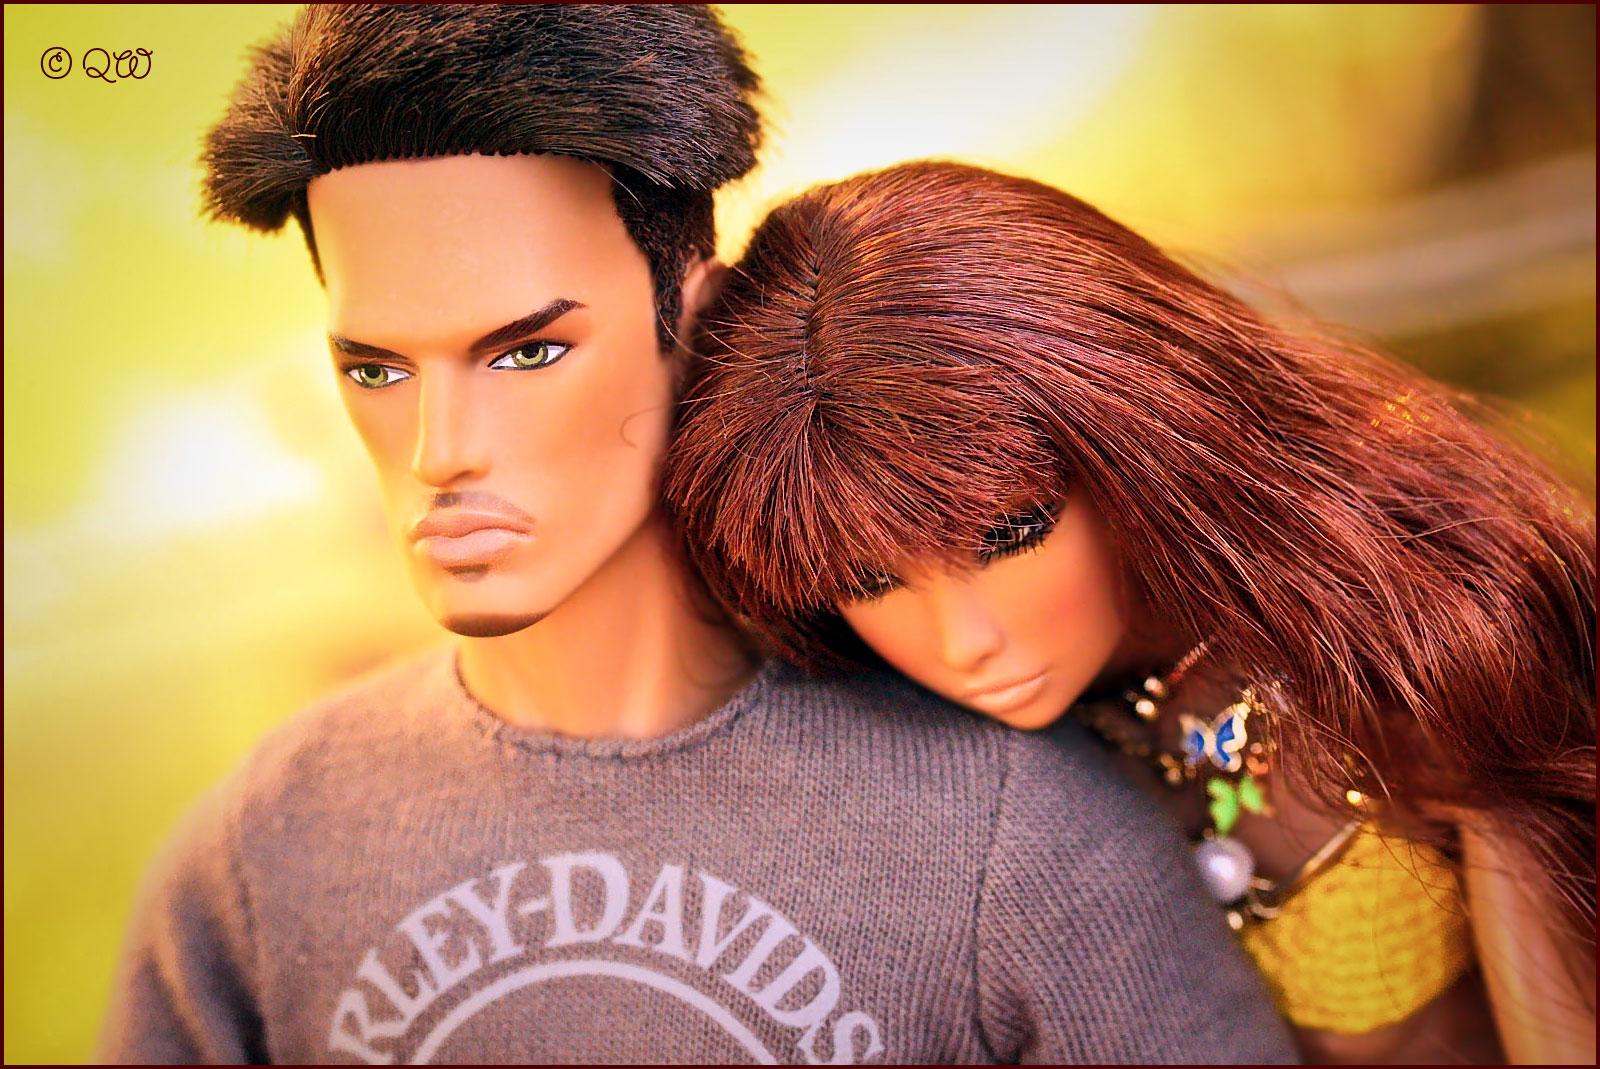 Most Inspiring Wallpaper Love Barbie - red_orange_brown_man_male_green_love_beauty-1079656  Pic_573977.jpg!d